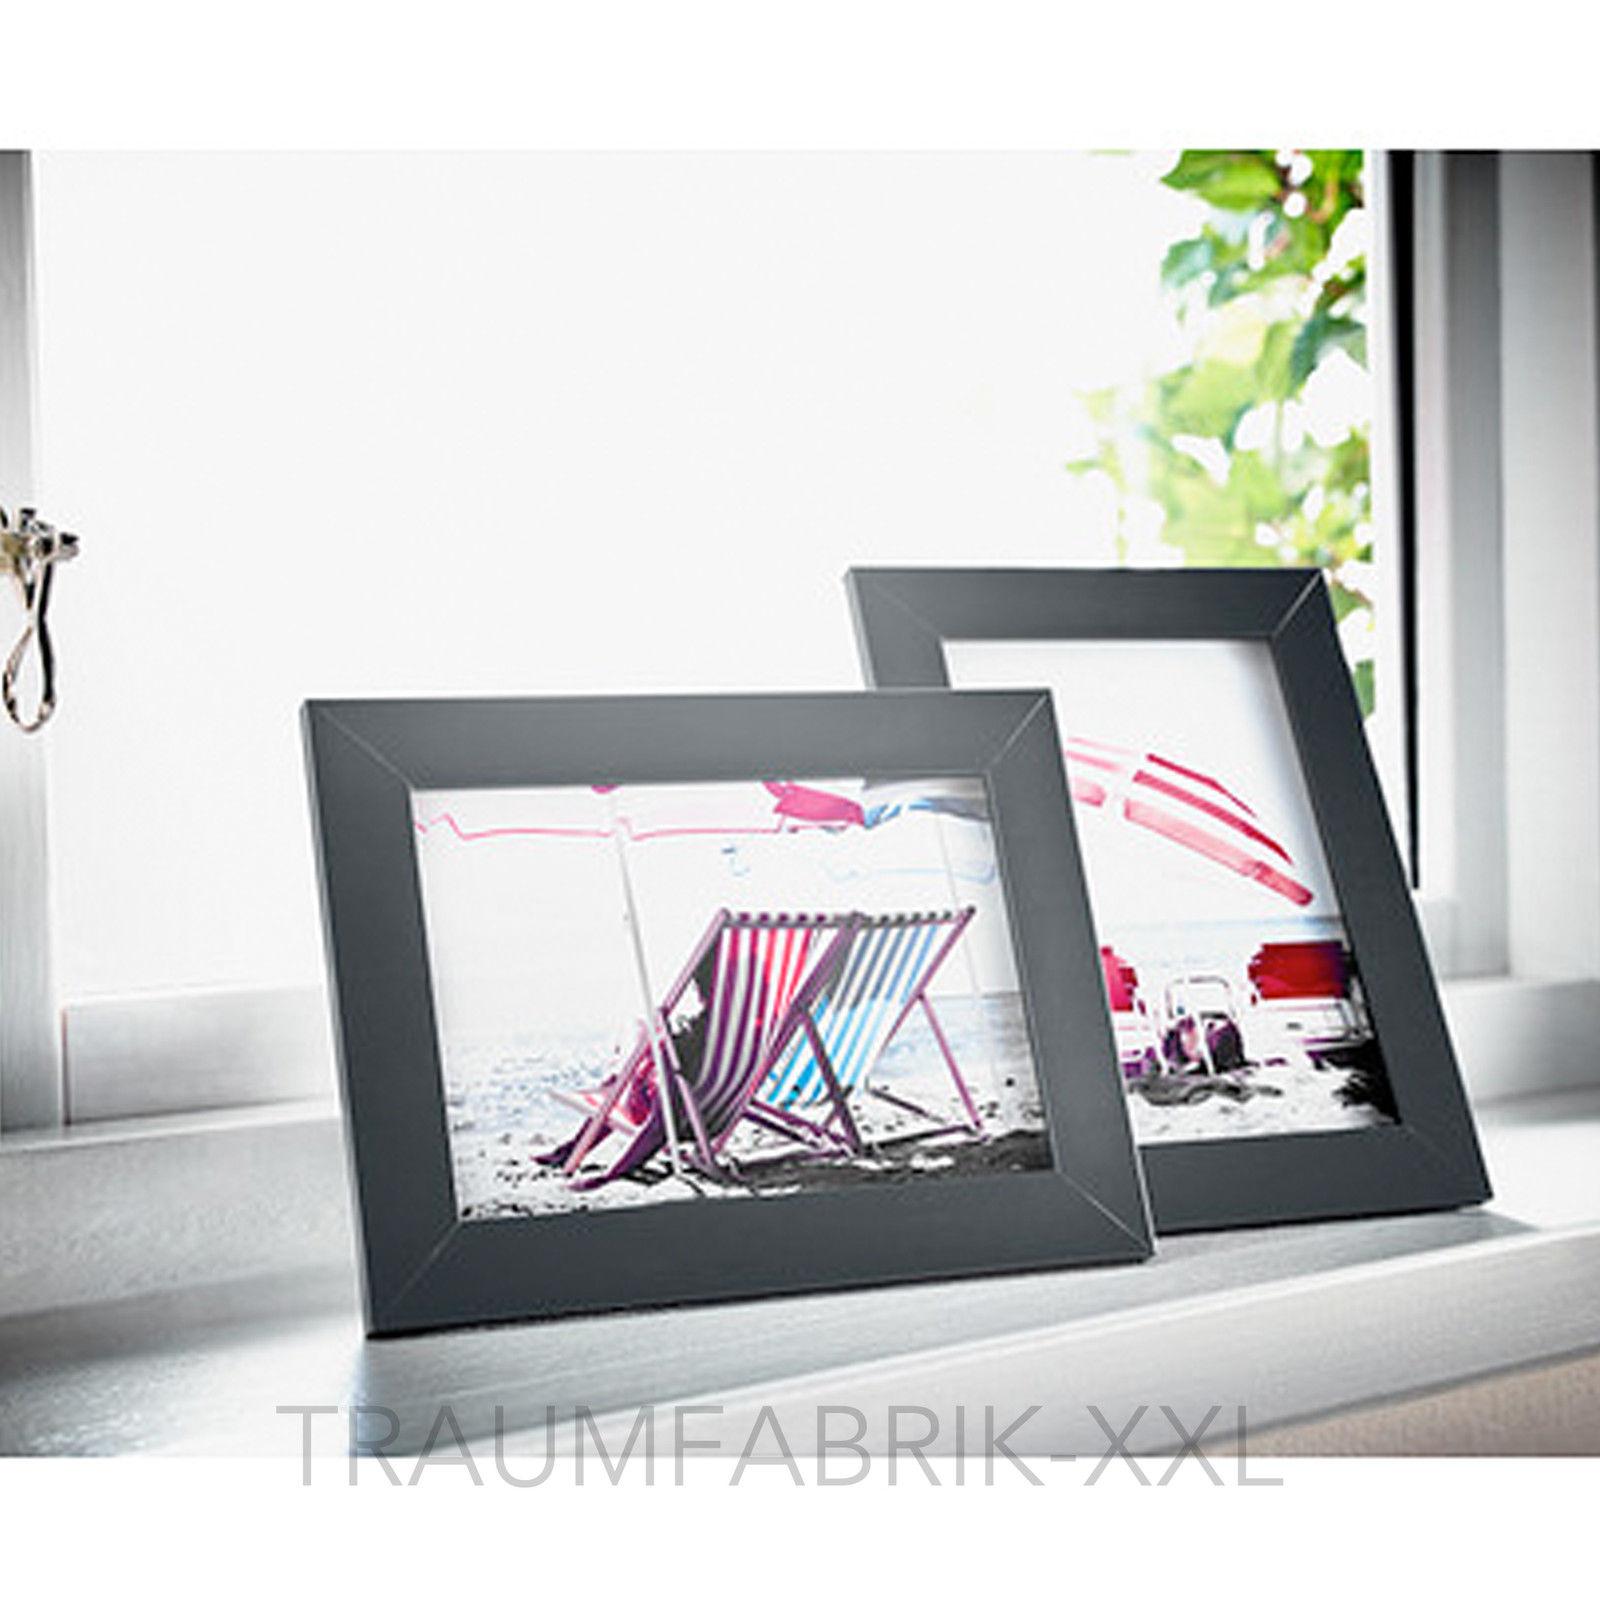 2 x bilderrahmen 13 18 cm schwarz holzbilderrahmen. Black Bedroom Furniture Sets. Home Design Ideas